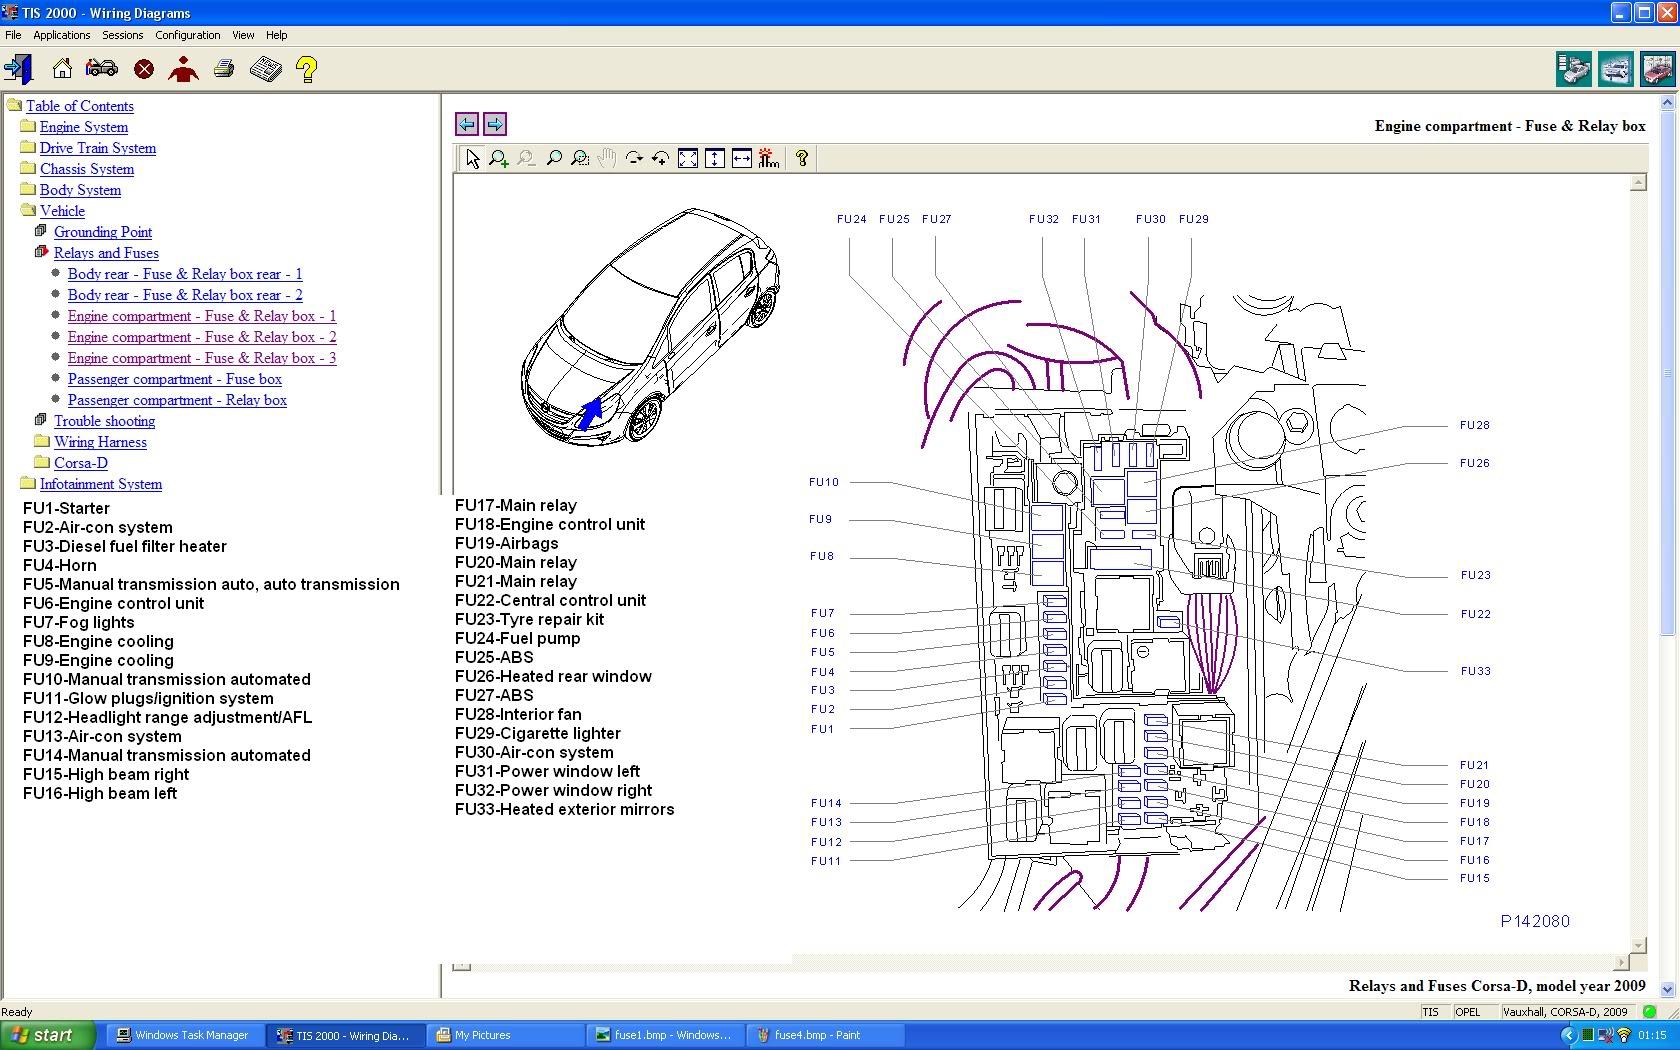 opel corsa fuse box manual wiring diagram 2008 corsa d fuse box diagram opel corsa fuse box manual era